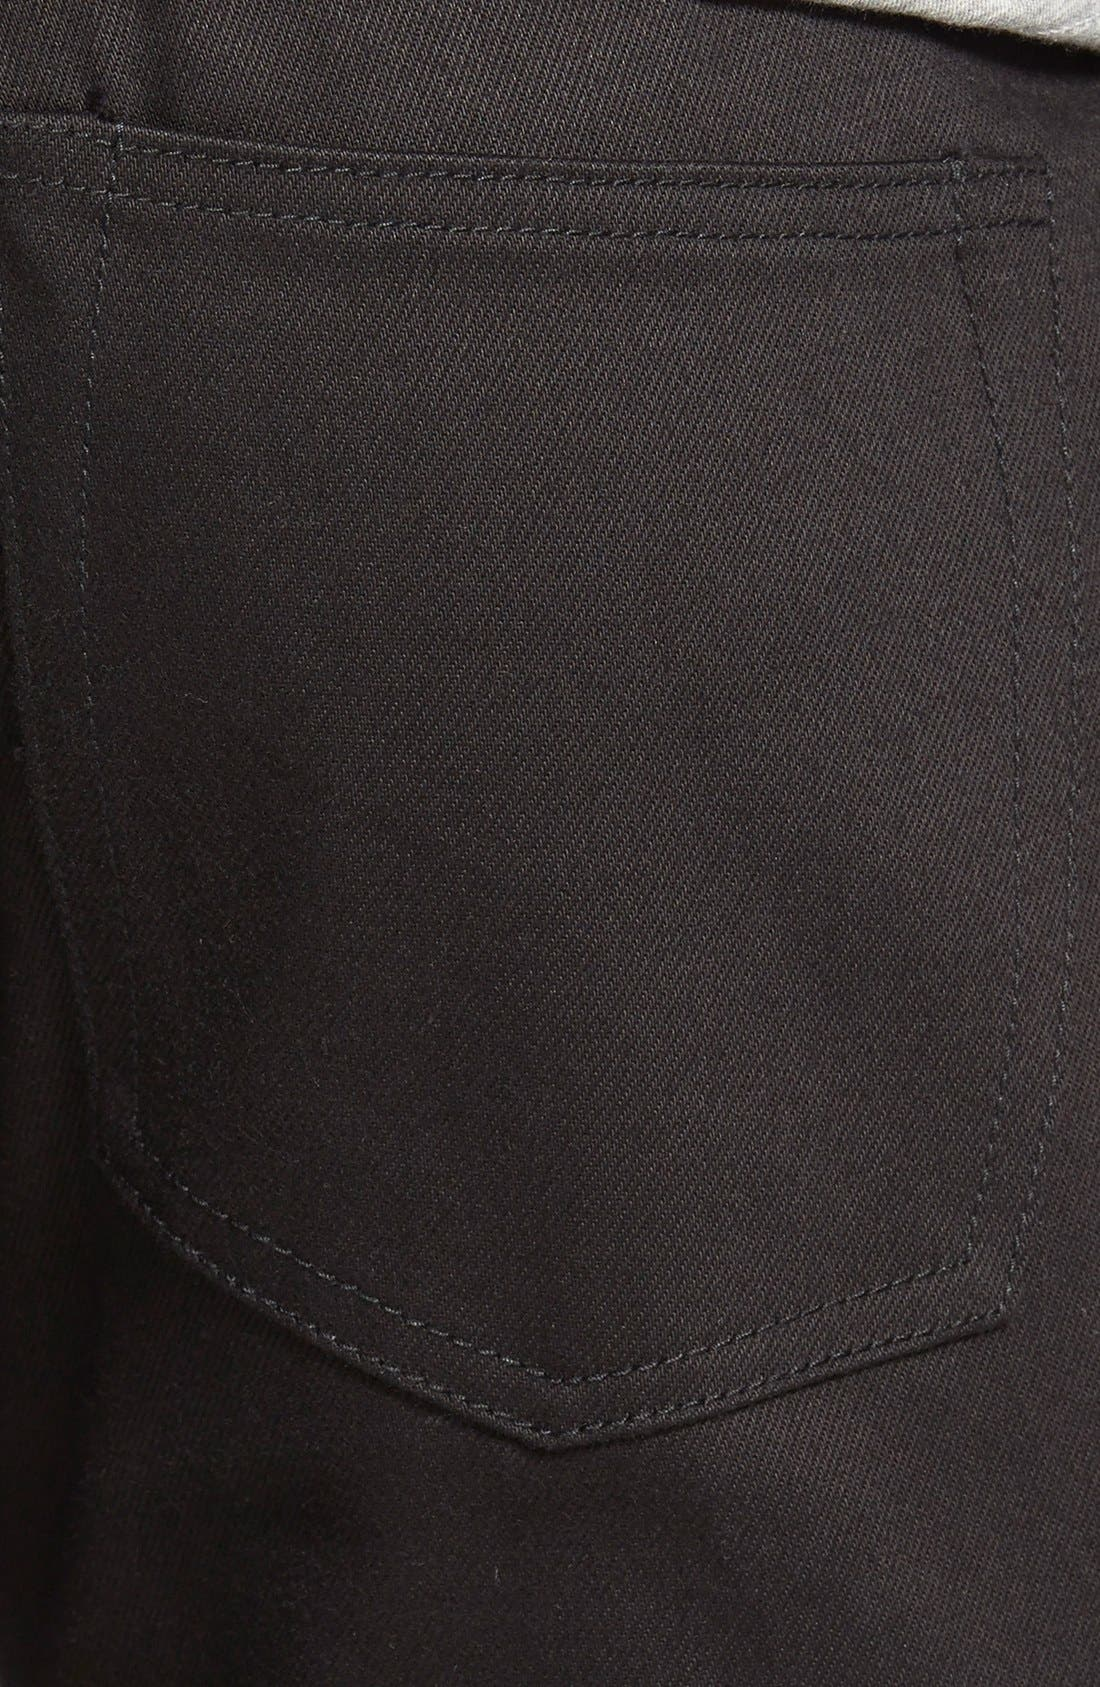 Alternate Image 4  - The Unbranded Brand 'UB255' Slim Tapered Fit Raw Selvedge Jeans (Black Selvedge)